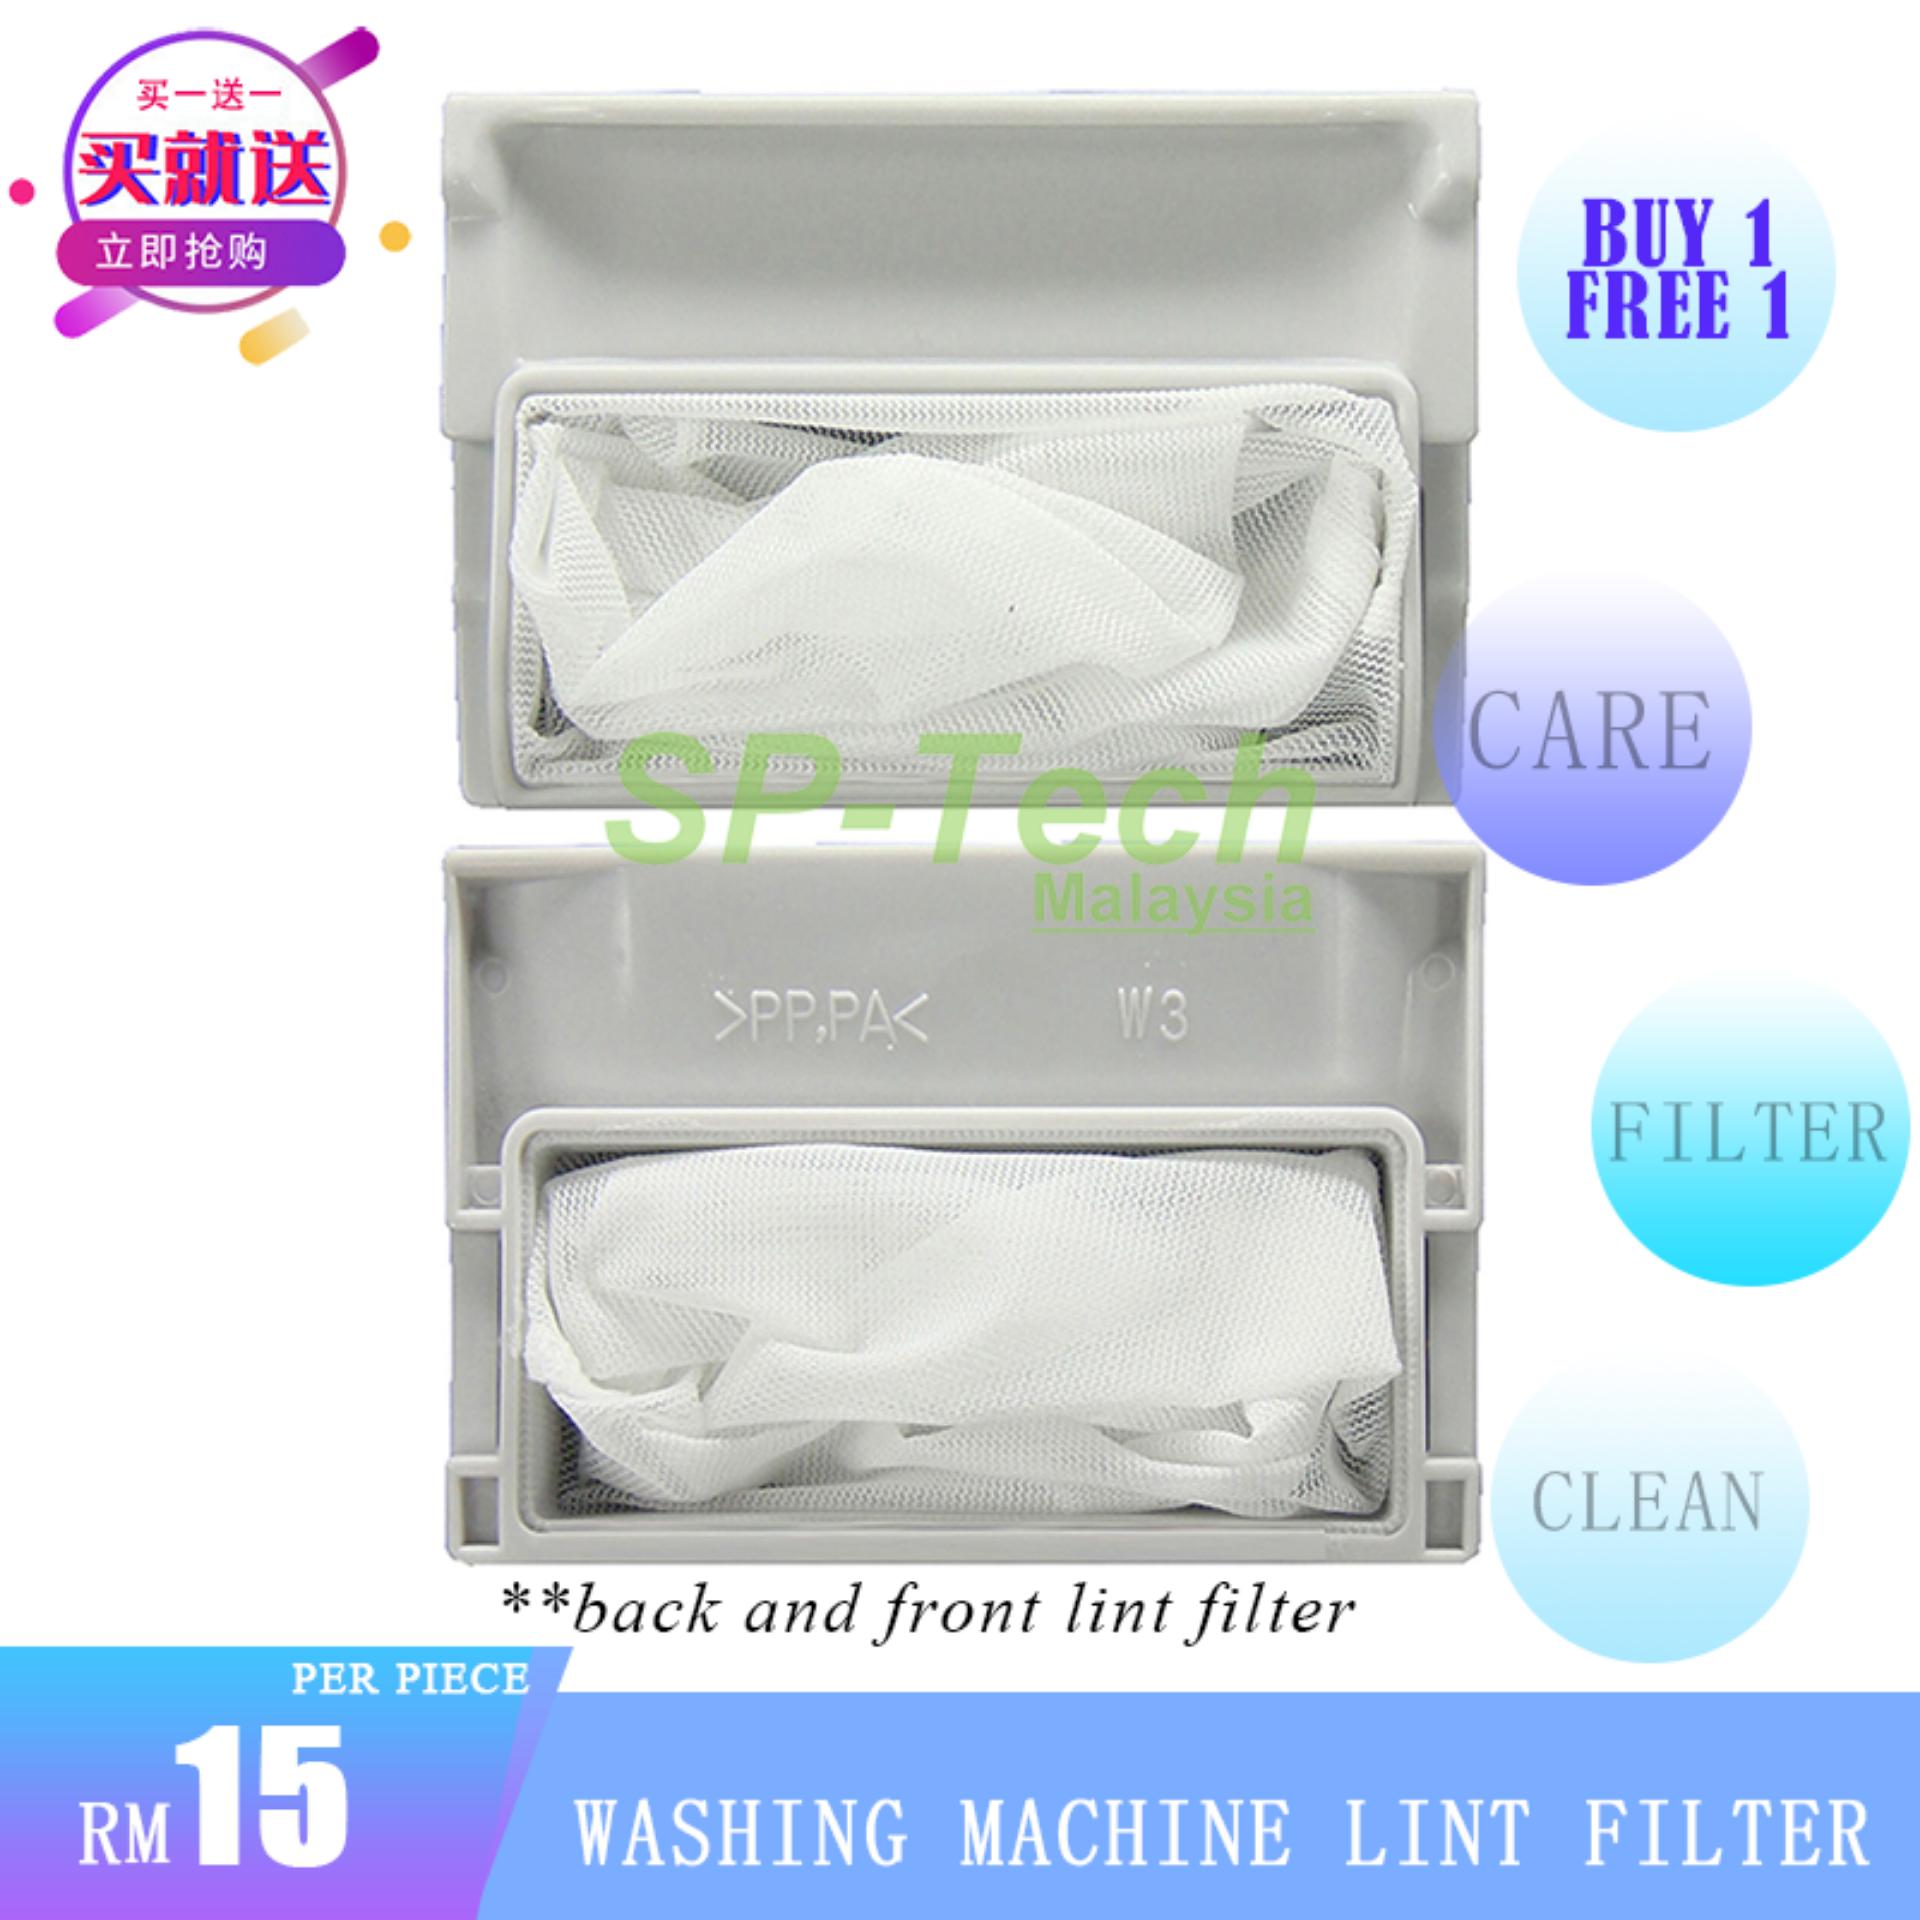 Wf F60pc Lg Washing Machine Lint Filter